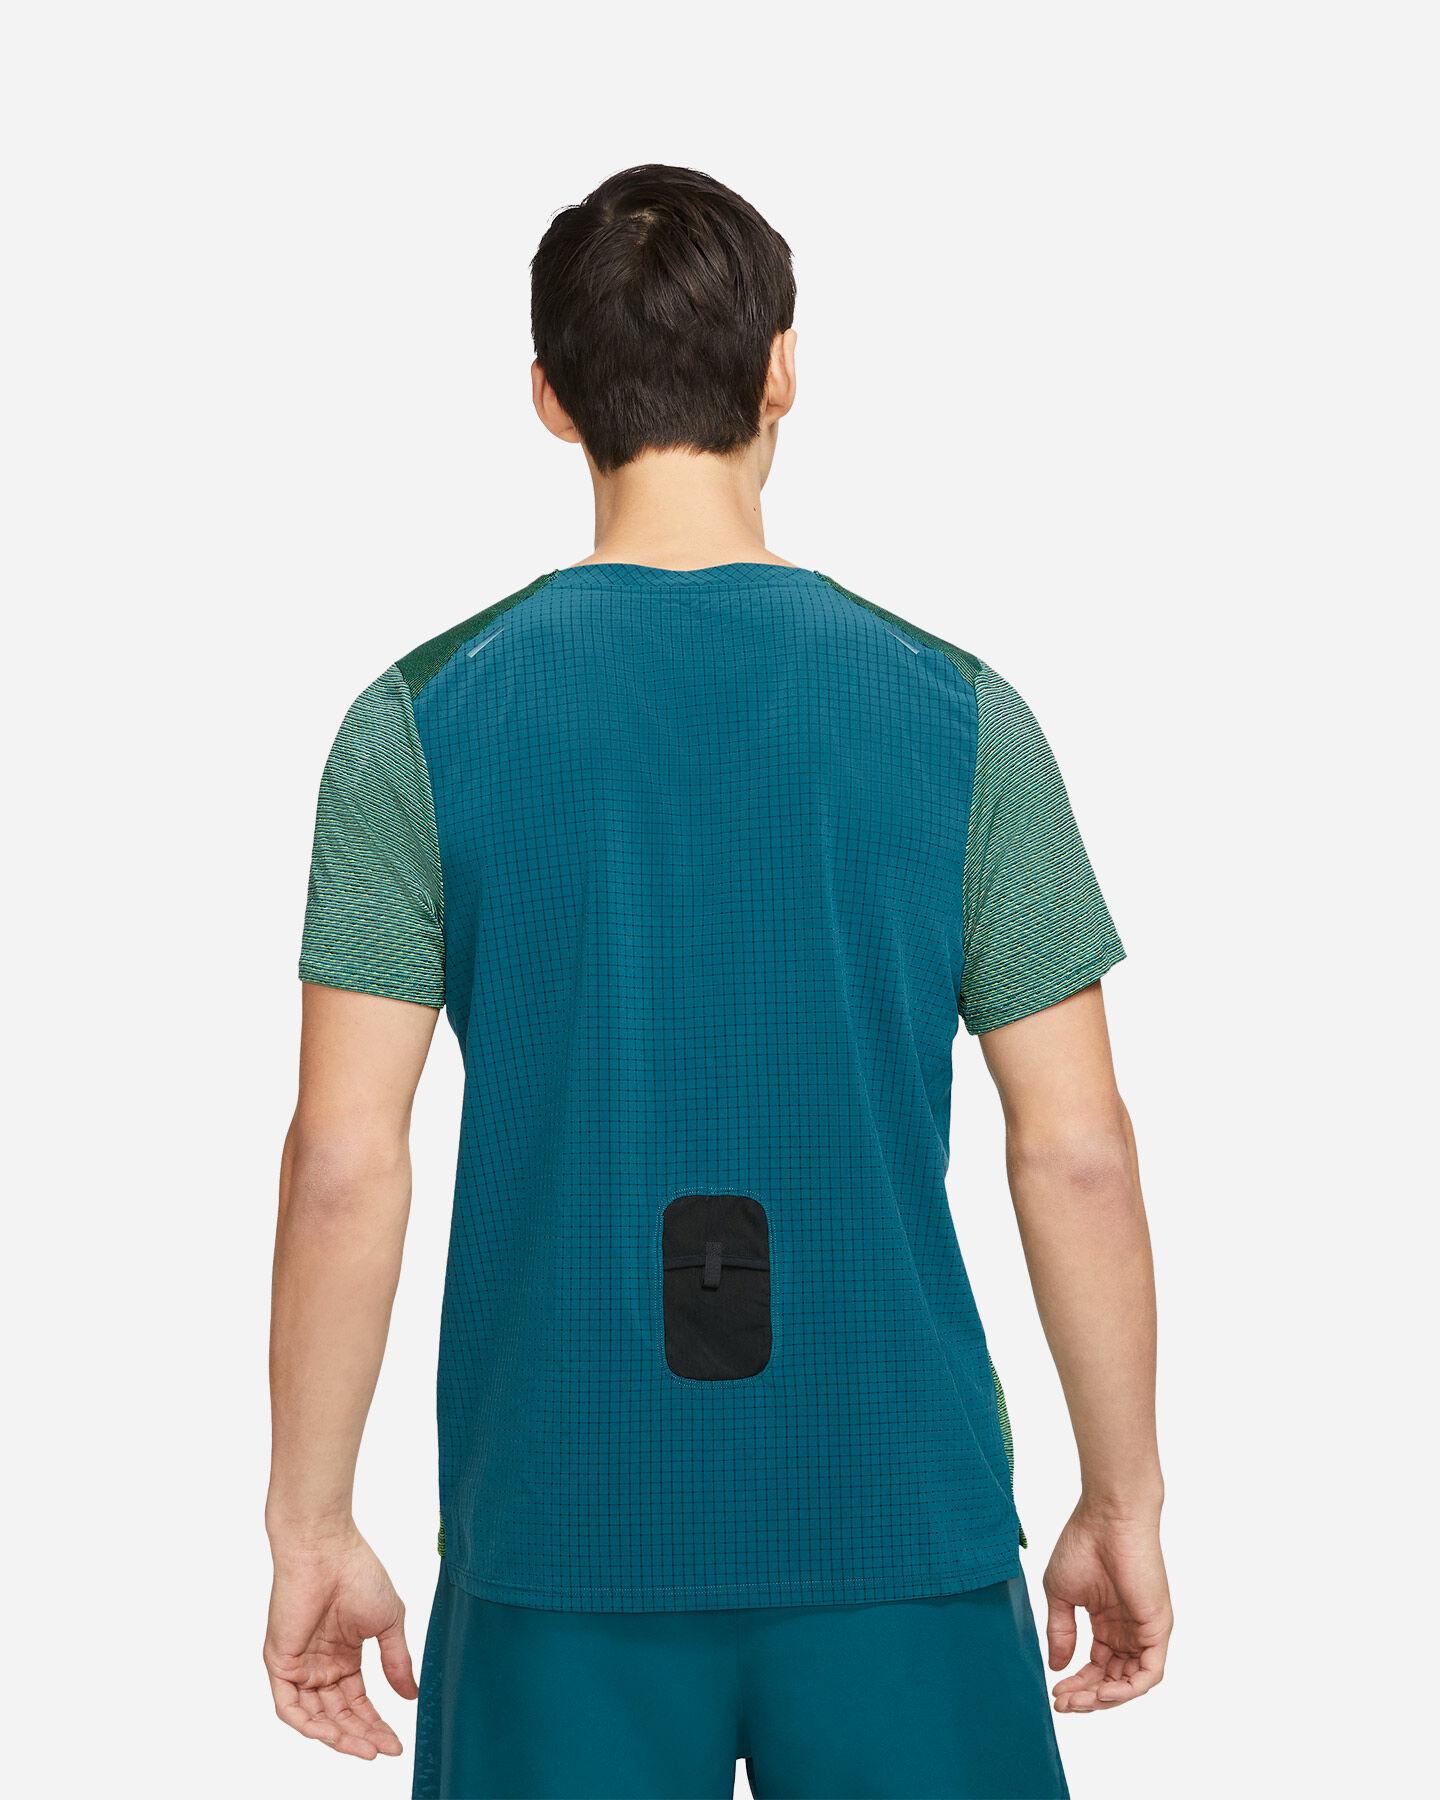 T-Shirt running NIKE RUN DIVISION PINNACLE M S5269962 scatto 1